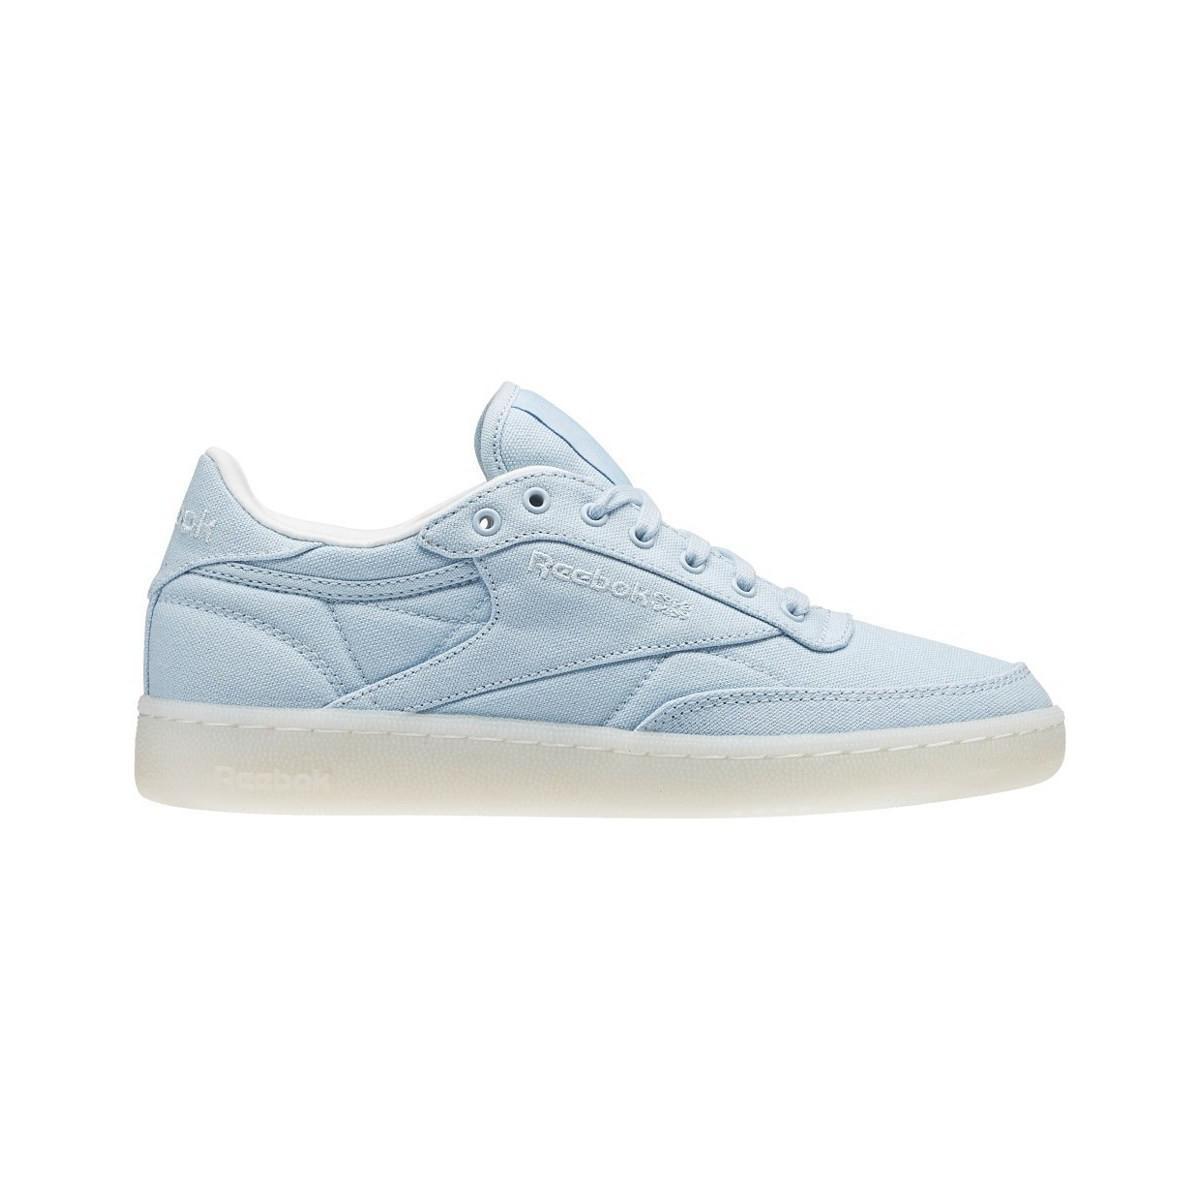 Reebok. Club C 85 Canvas Zee Blue Women s Shoes (trainers) In Multicolour 2b8284e27